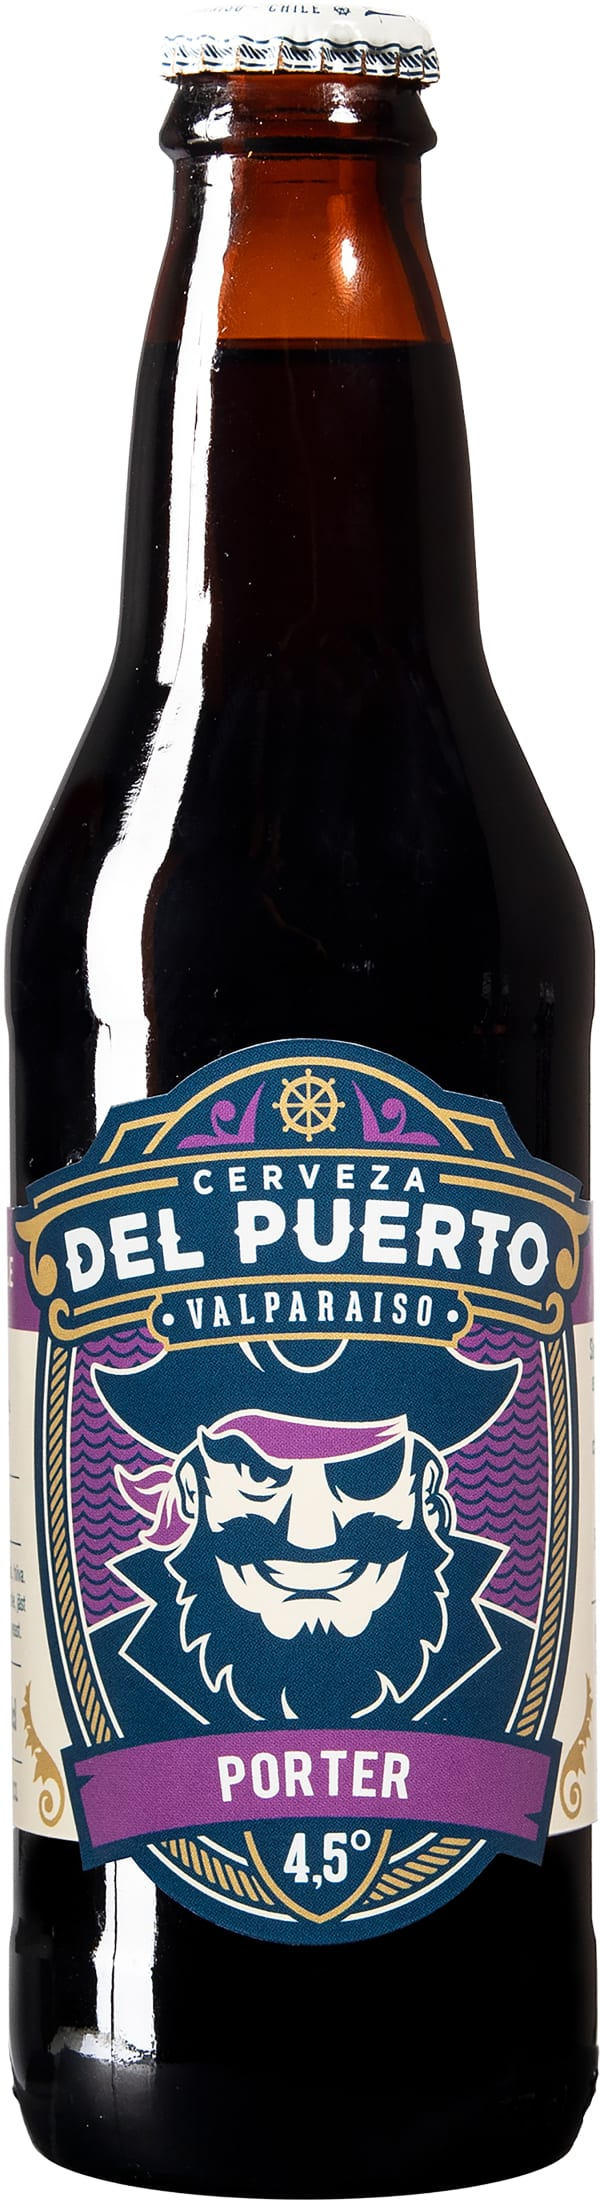 Cerveza del Puerto Porter